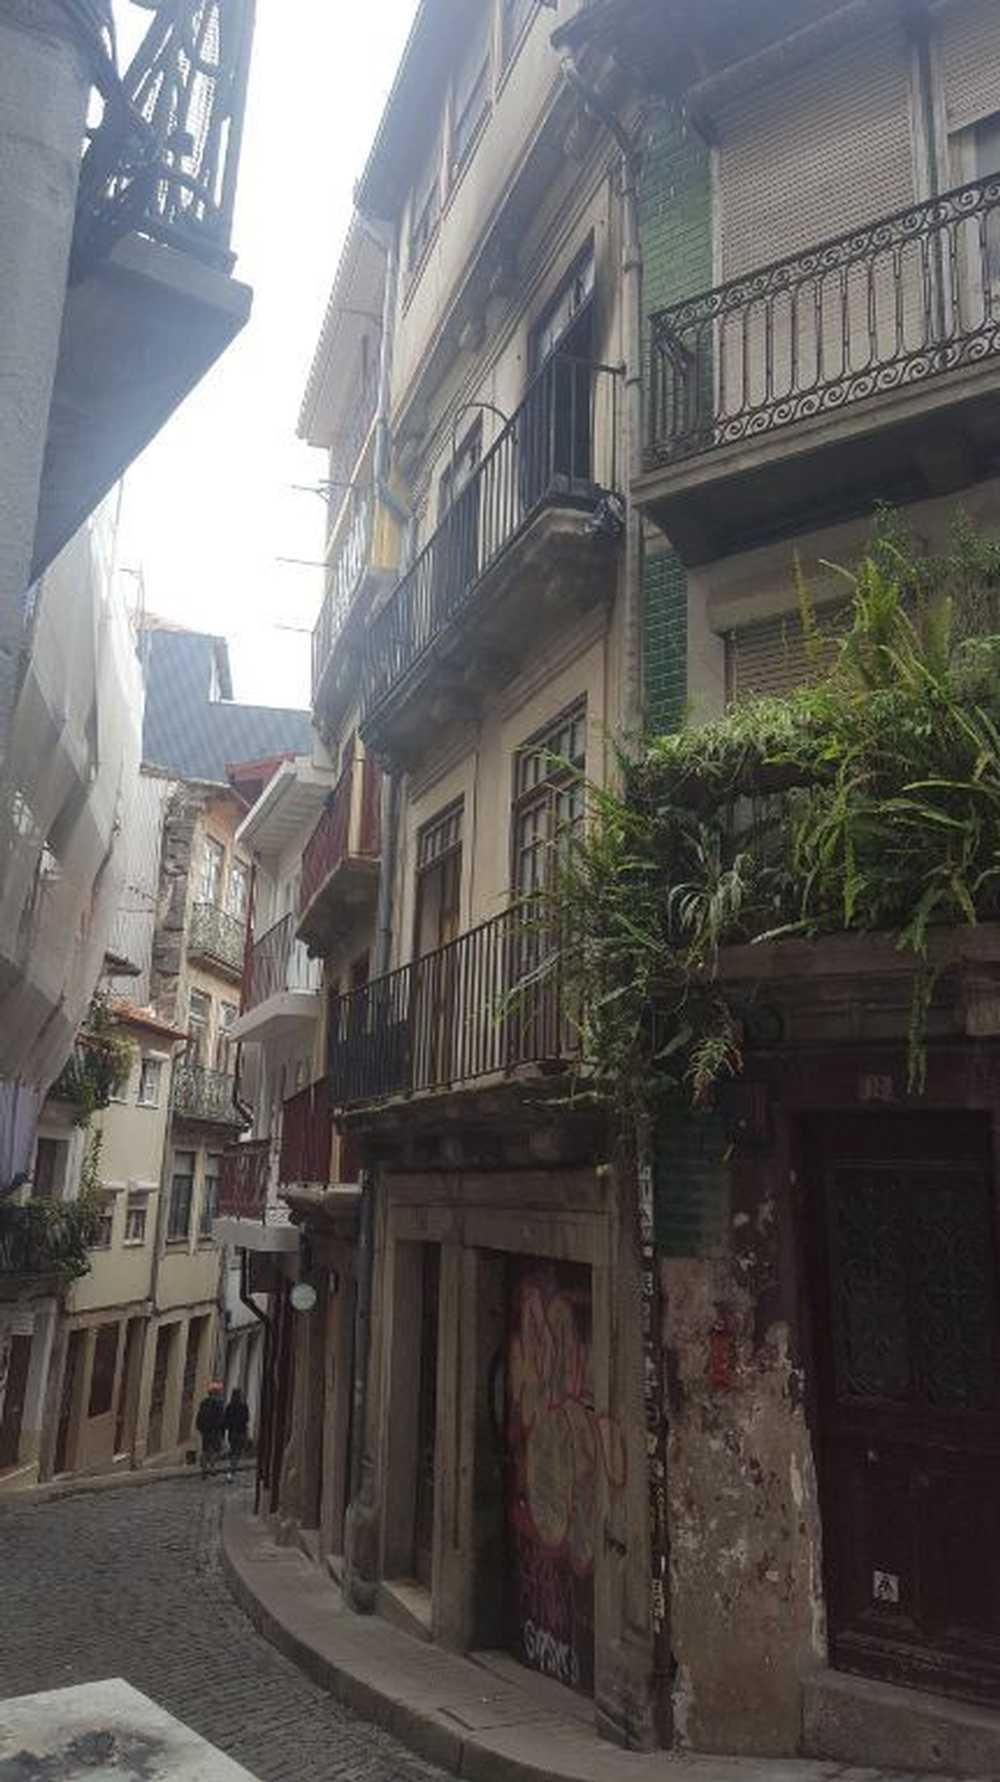 Borba de Godim Felgueiras Apartment Bild 97632